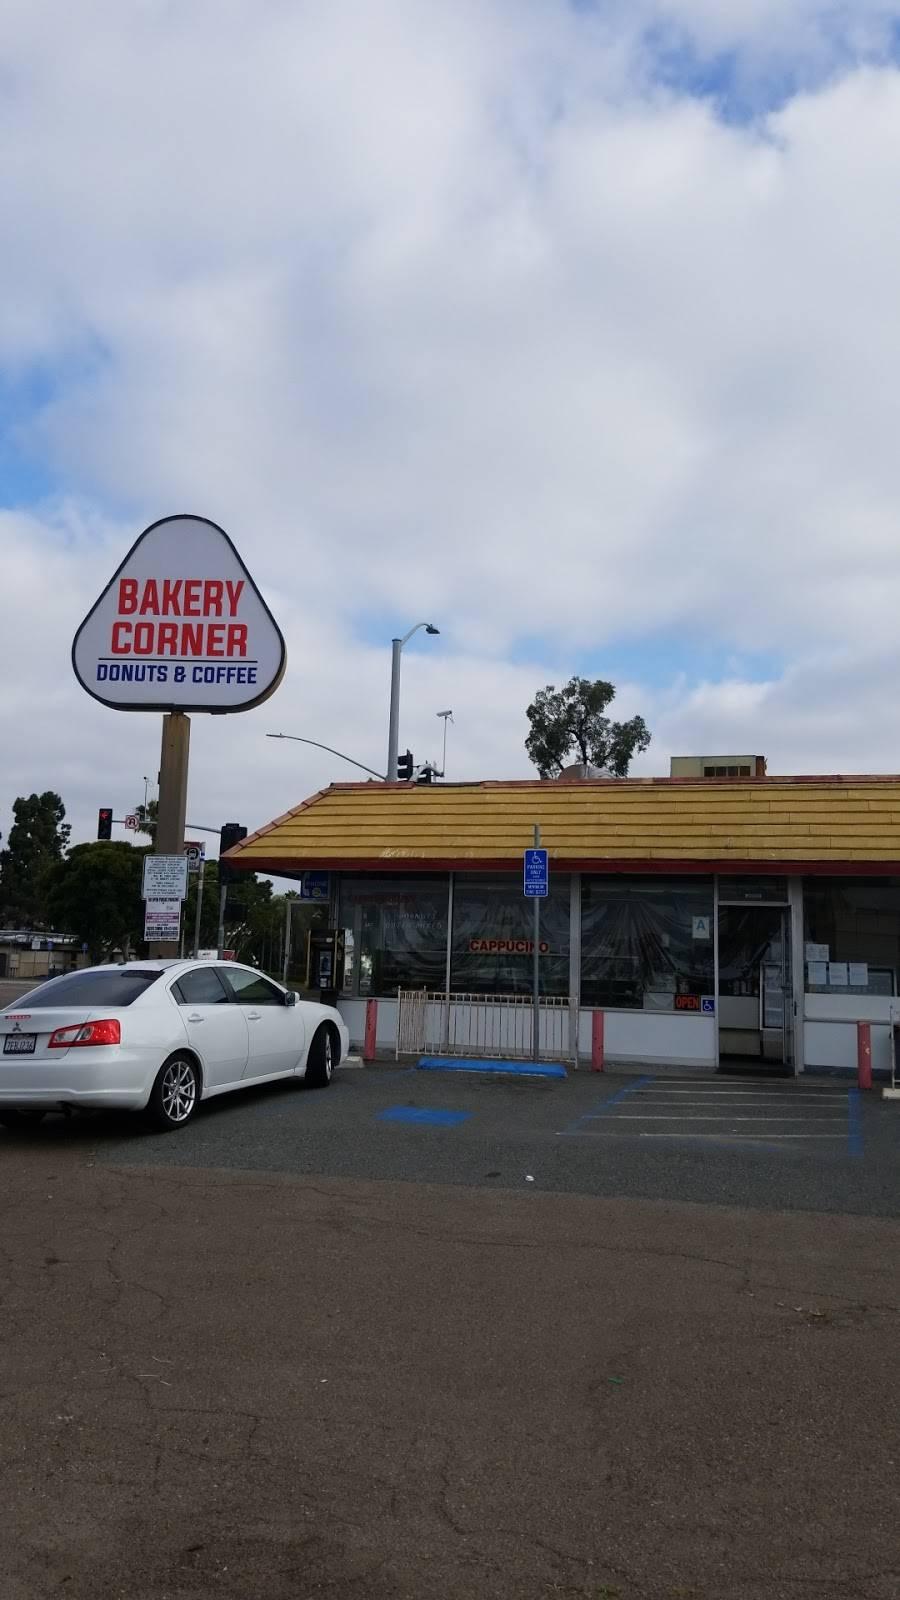 Bakery Corner Donuts - bakery  | Photo 7 of 8 | Address: 1001 3rd Ave, Chula Vista, CA 91911, USA | Phone: (619) 420-5732